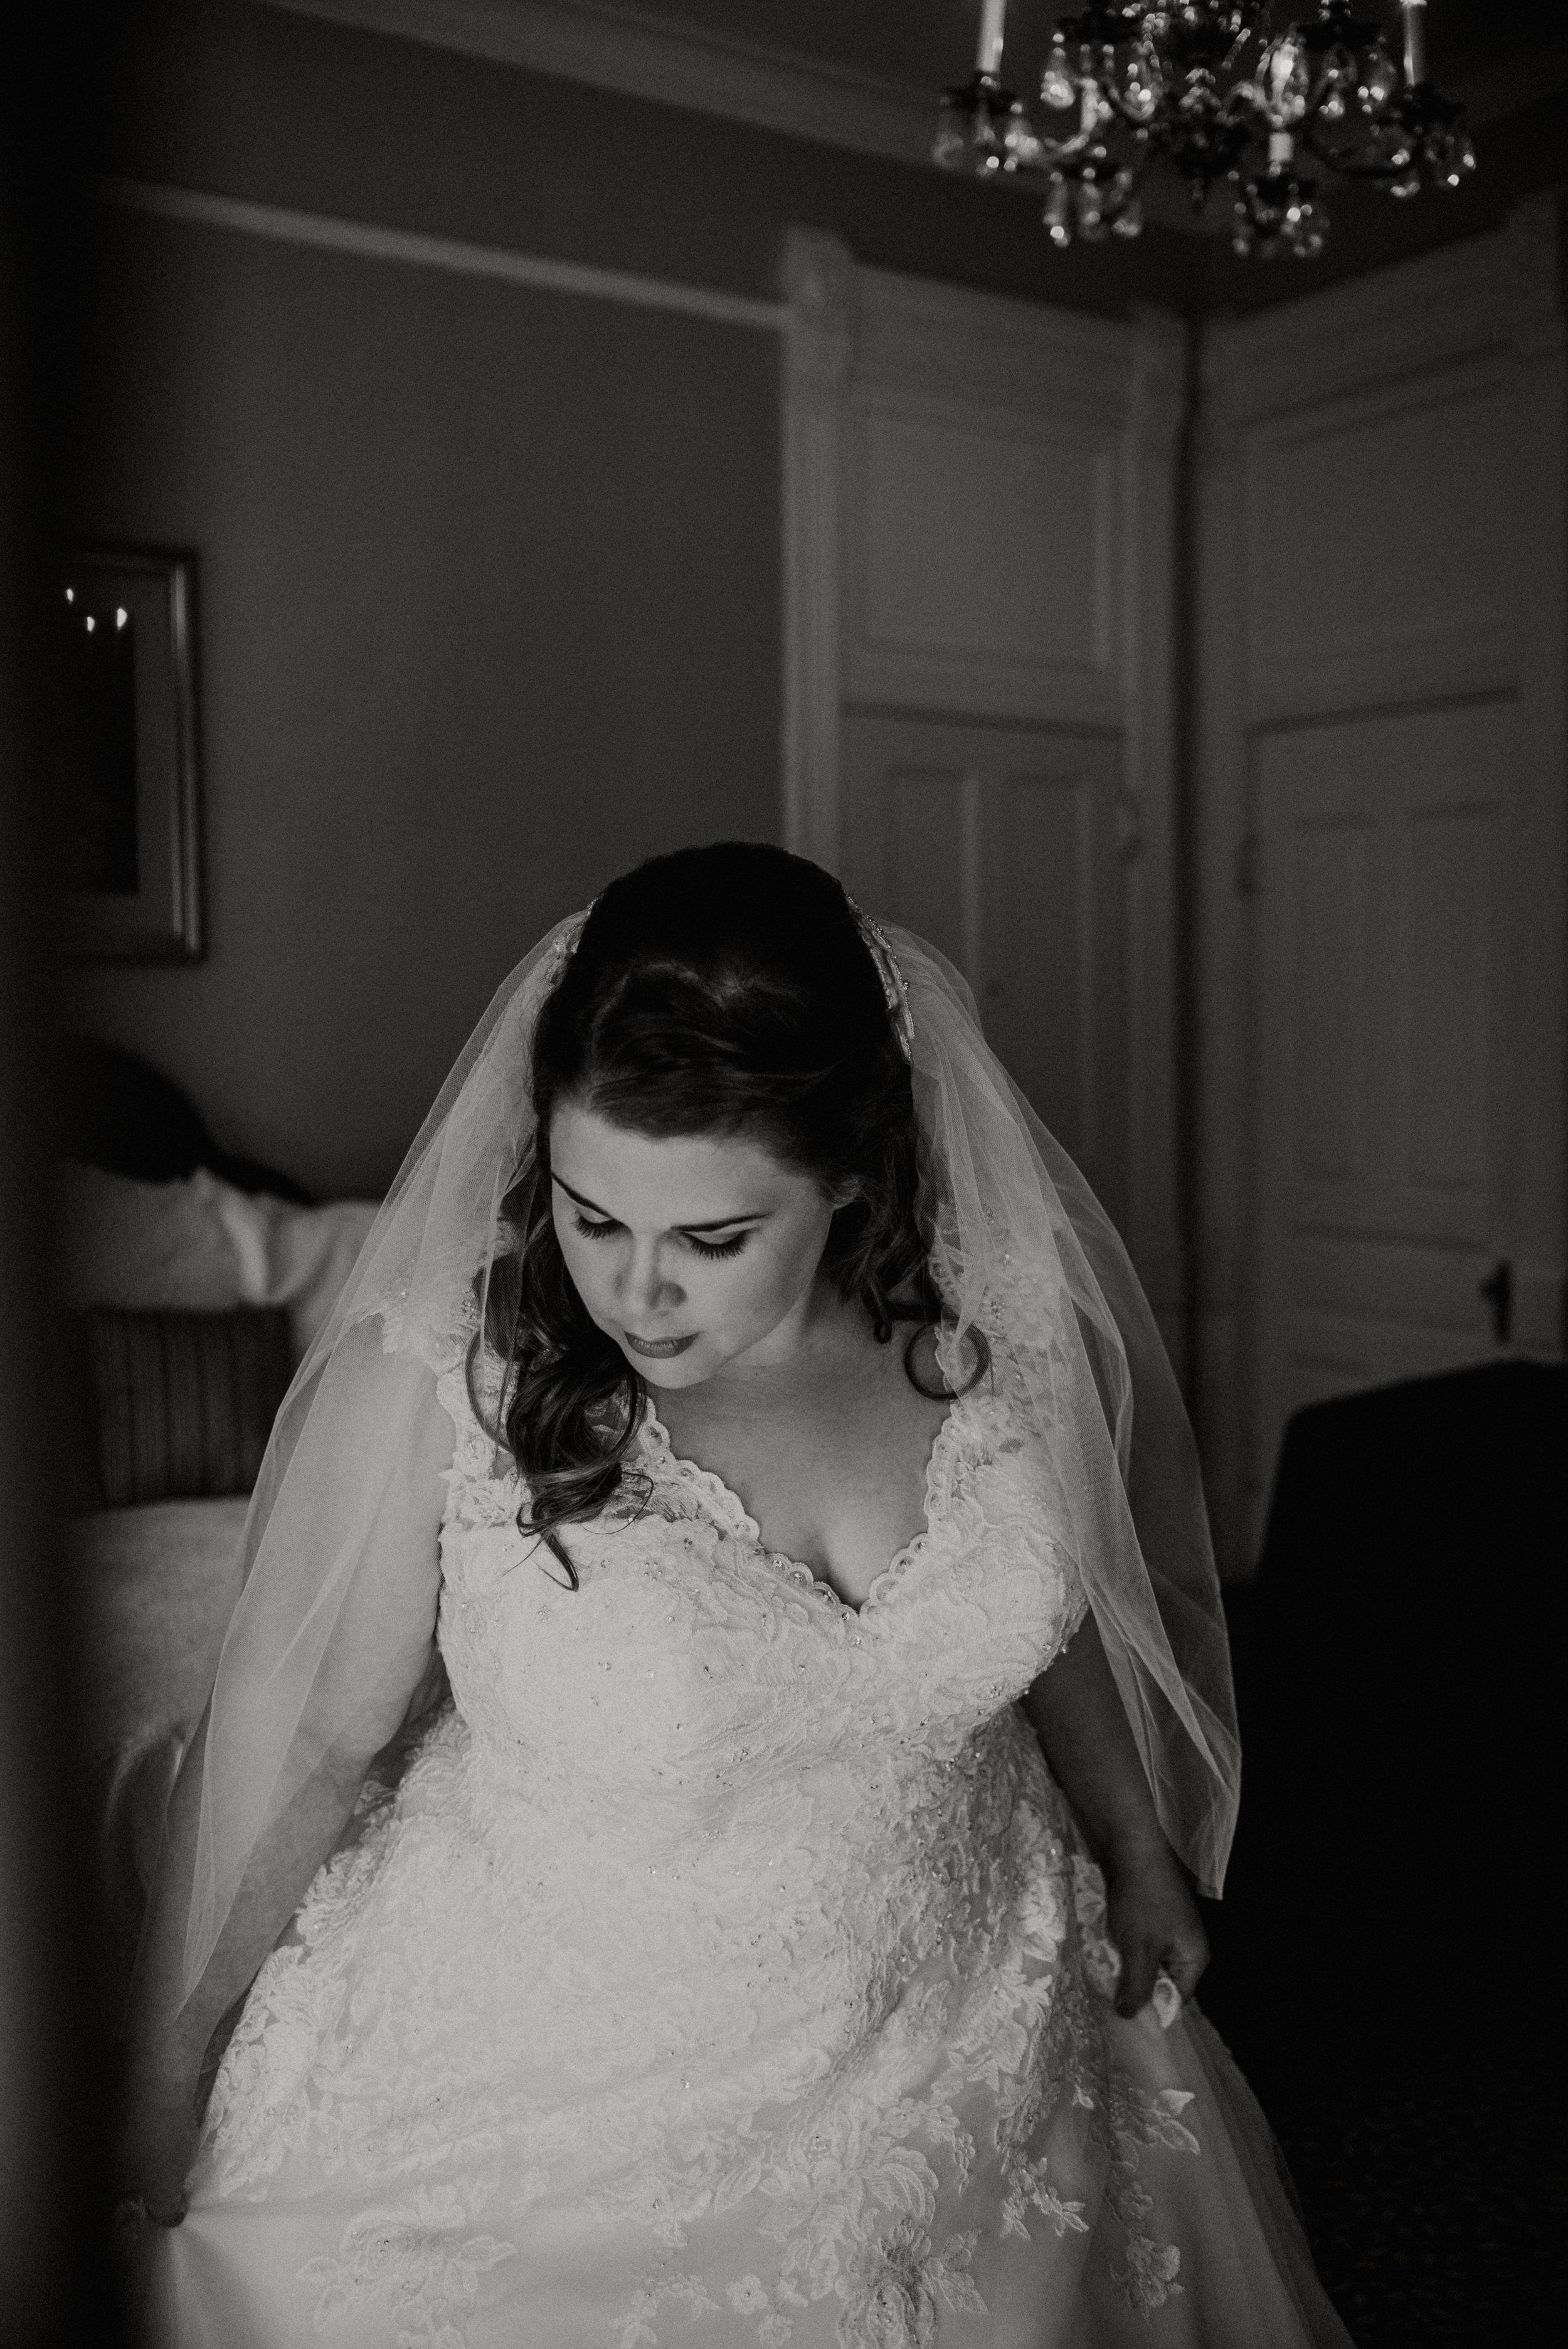 WonderlyCreative_Wedding_5.12.18_Megan&Swapnil_-479.jpg